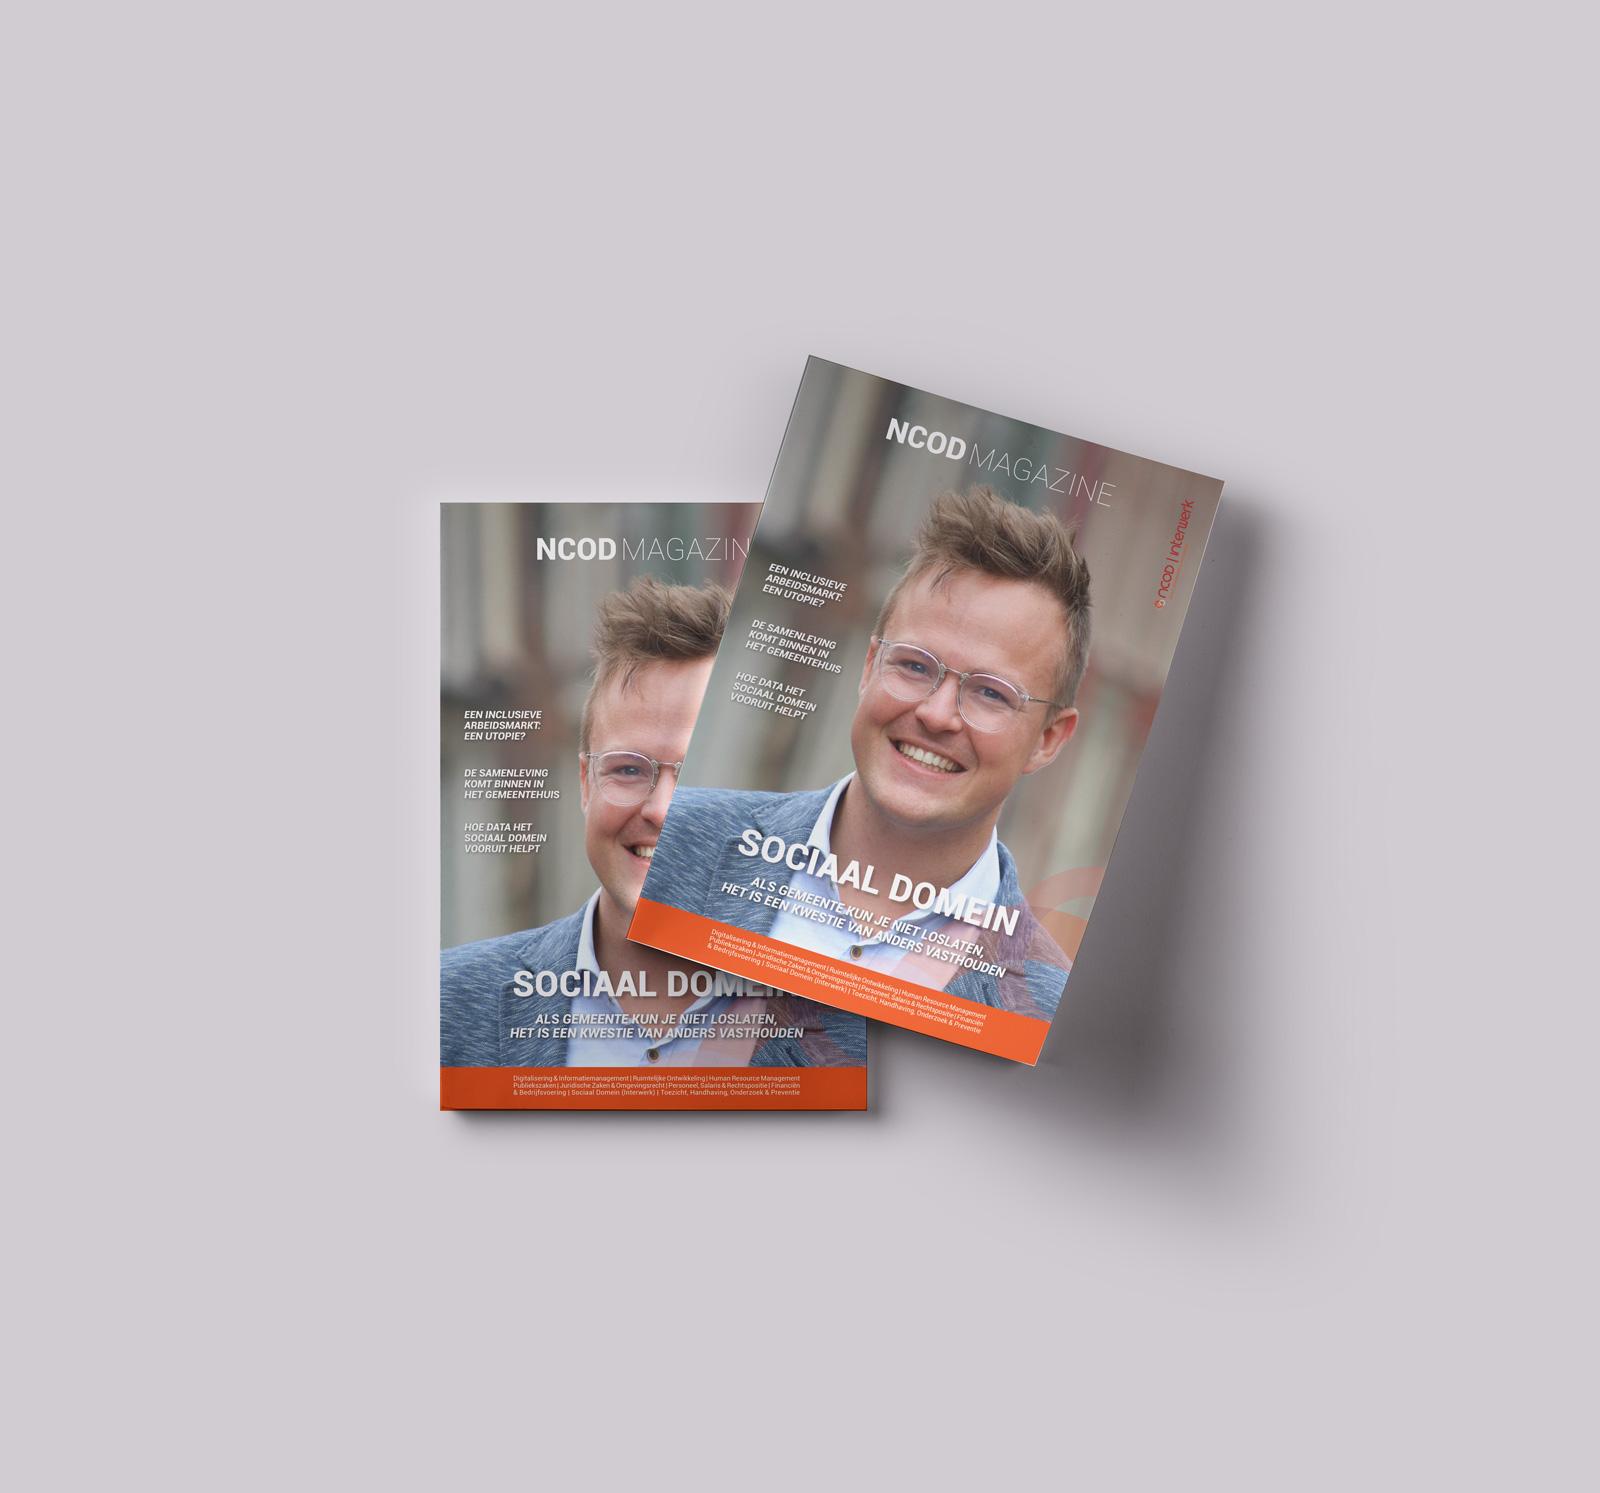 Beeldmarq - Grafische vormgeving & communicatie |NCOD magazine